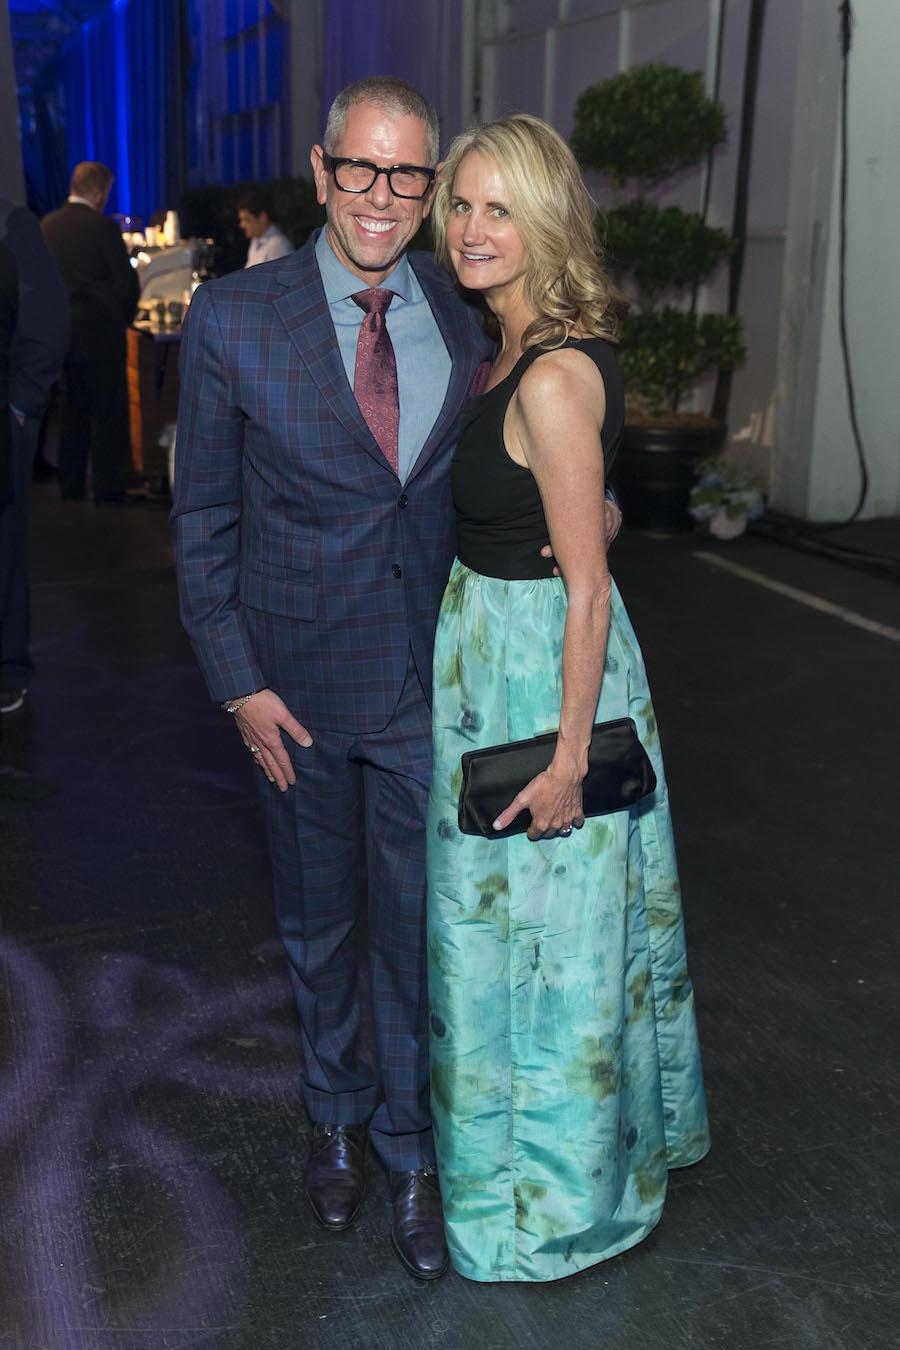 Andrew Freeman and Pam Roberts